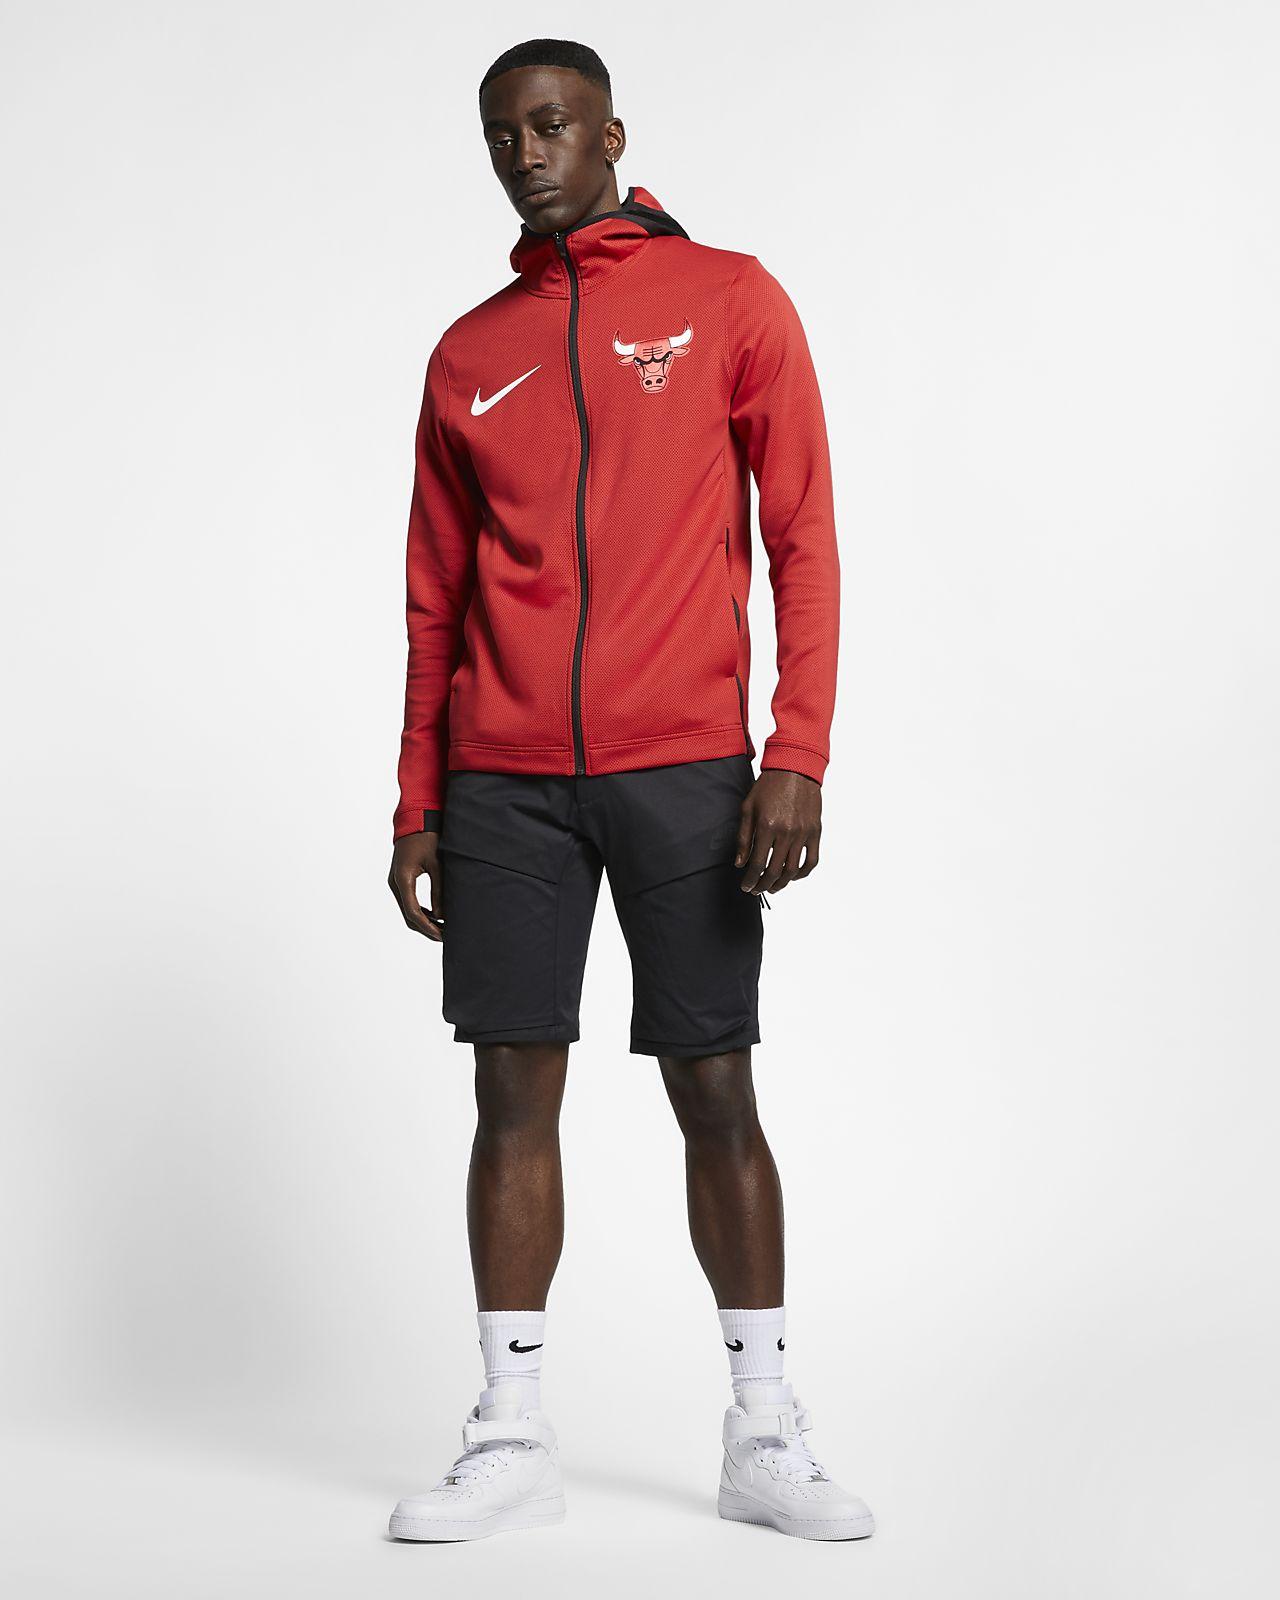 3f808c4870042 Chicago Bulls Nike Therma Flex Showtime Men's NBA Hoodie. Nike.com